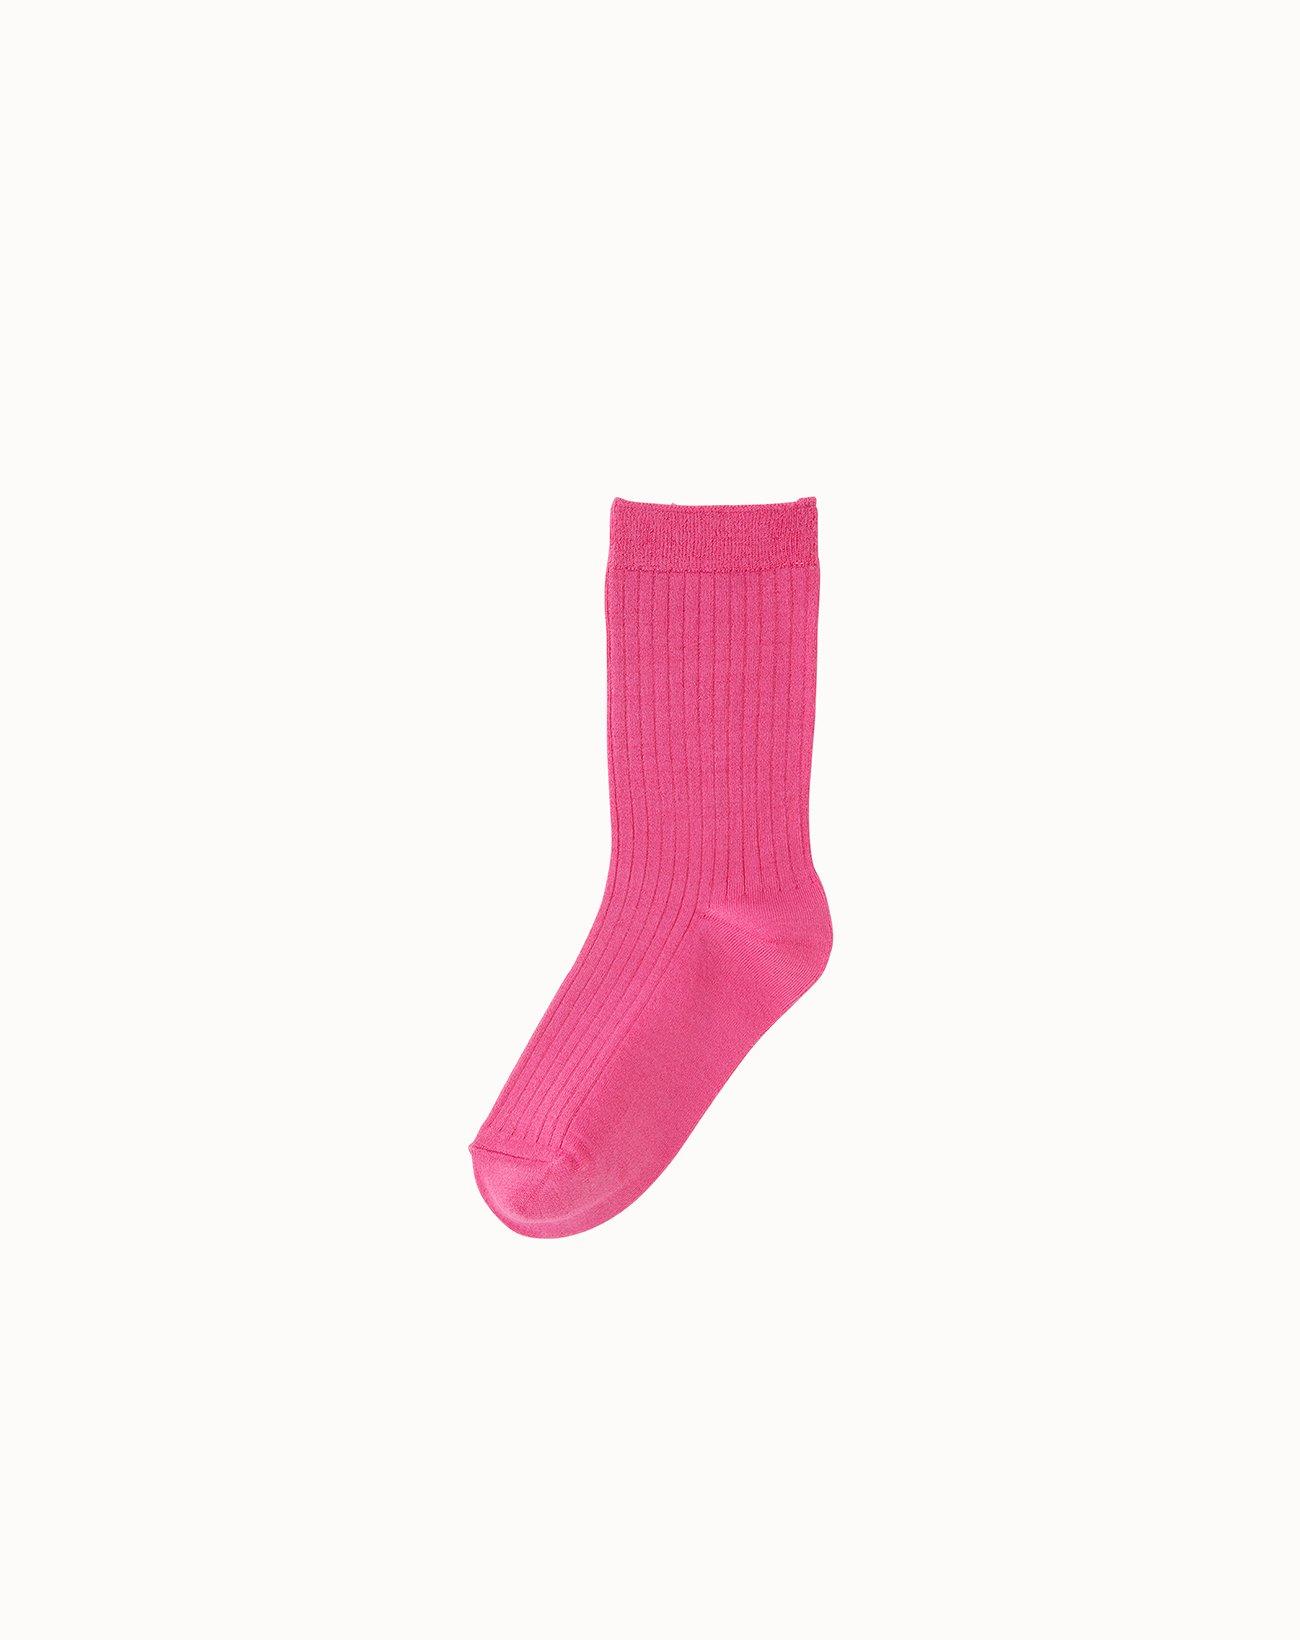 leur logette - Silk Rib Socks - Pink